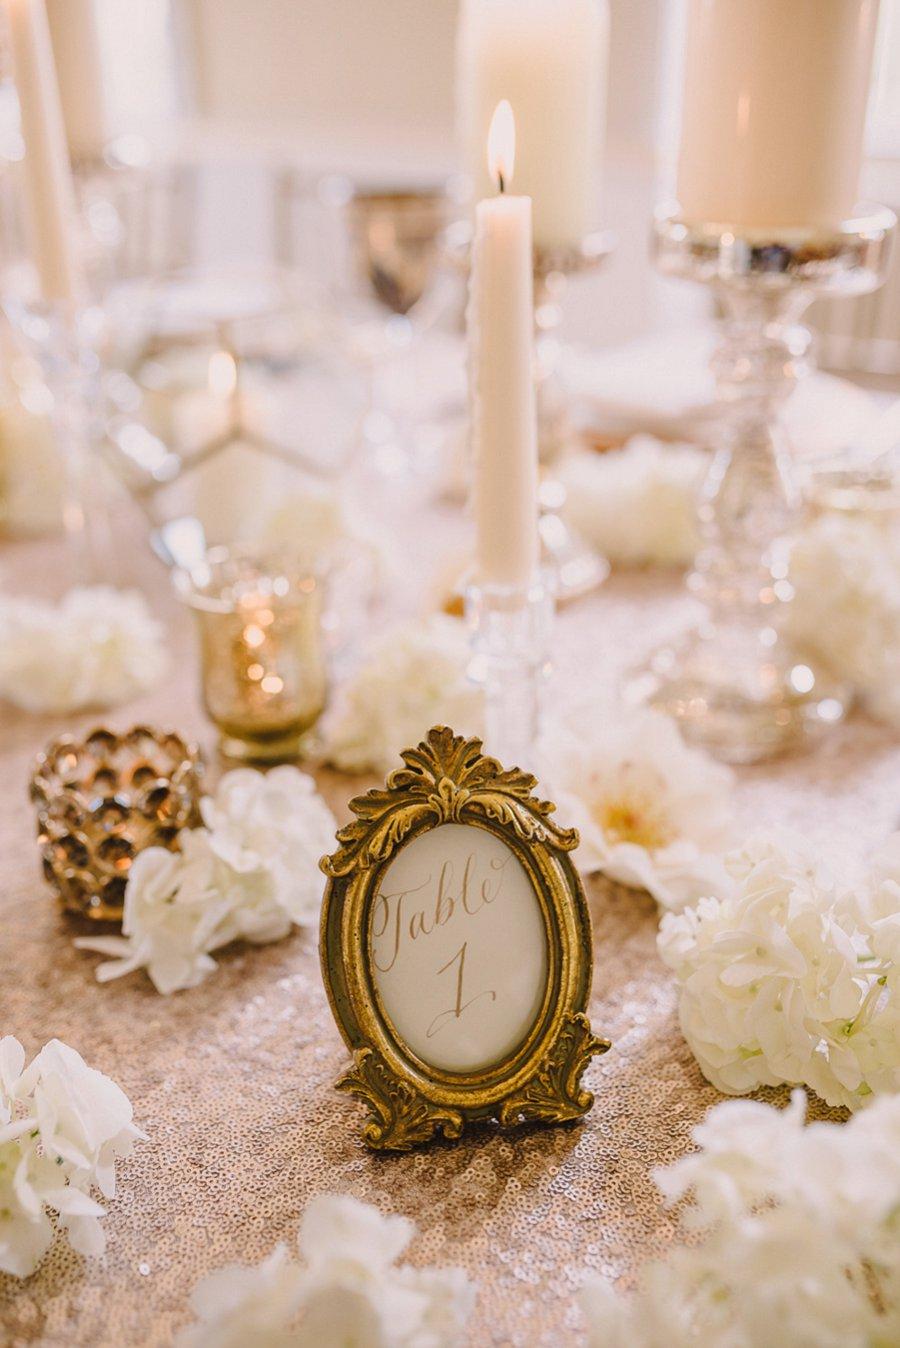 Stylish, Luxe Bridal Shoot With Elegant Tones of Gold, Nude & Marsala!